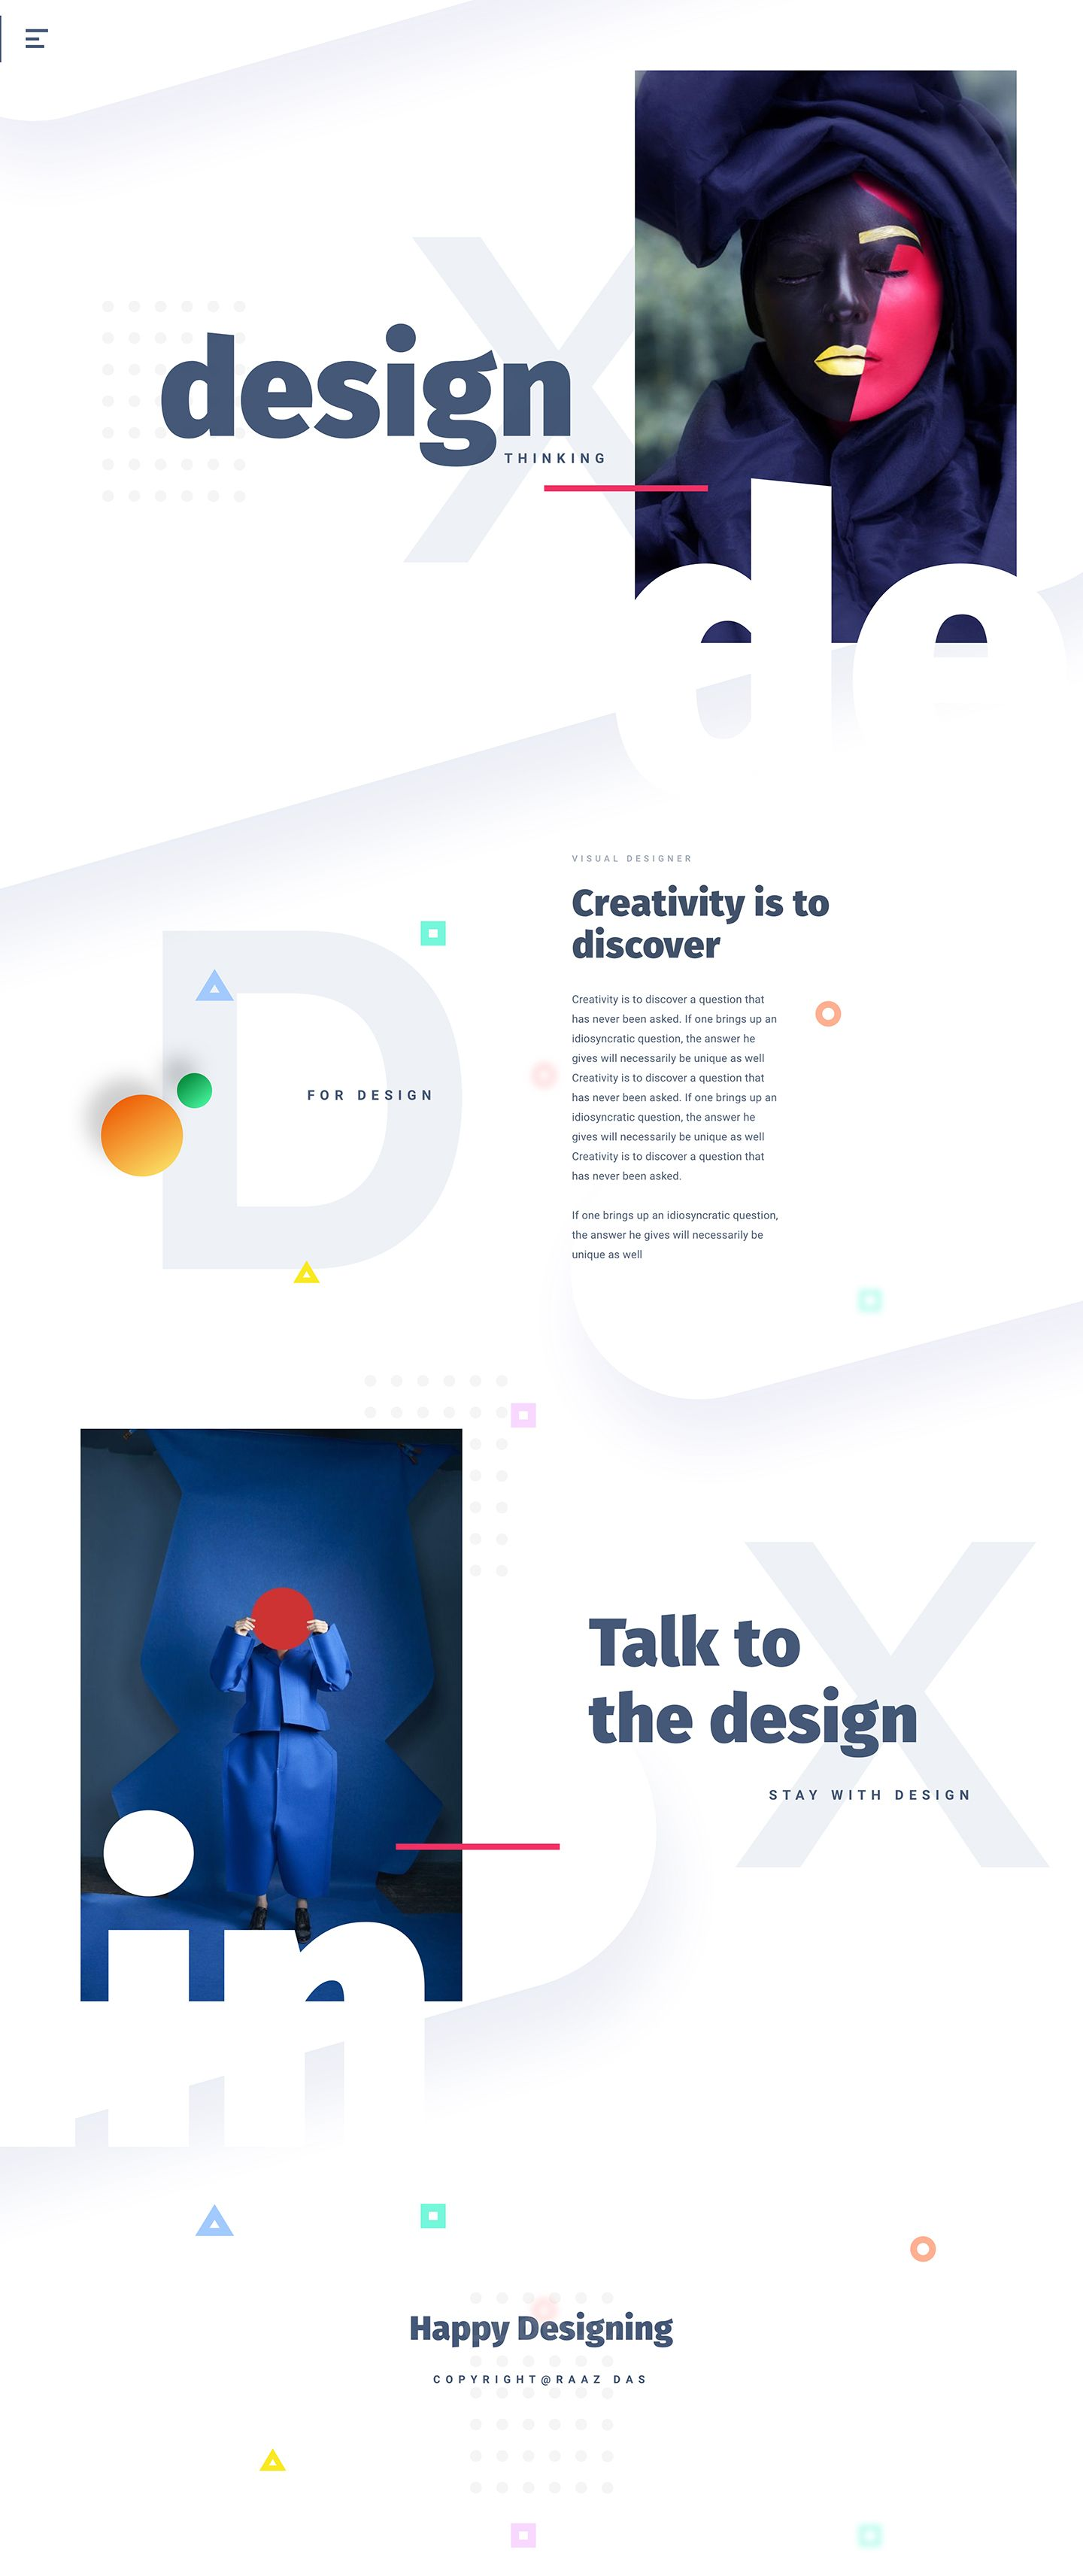 D E S I G N Creativity Is To Discover Webdesign Inspiration Landingpage Creative Website Design Web Design Tips Website Design Inspiration